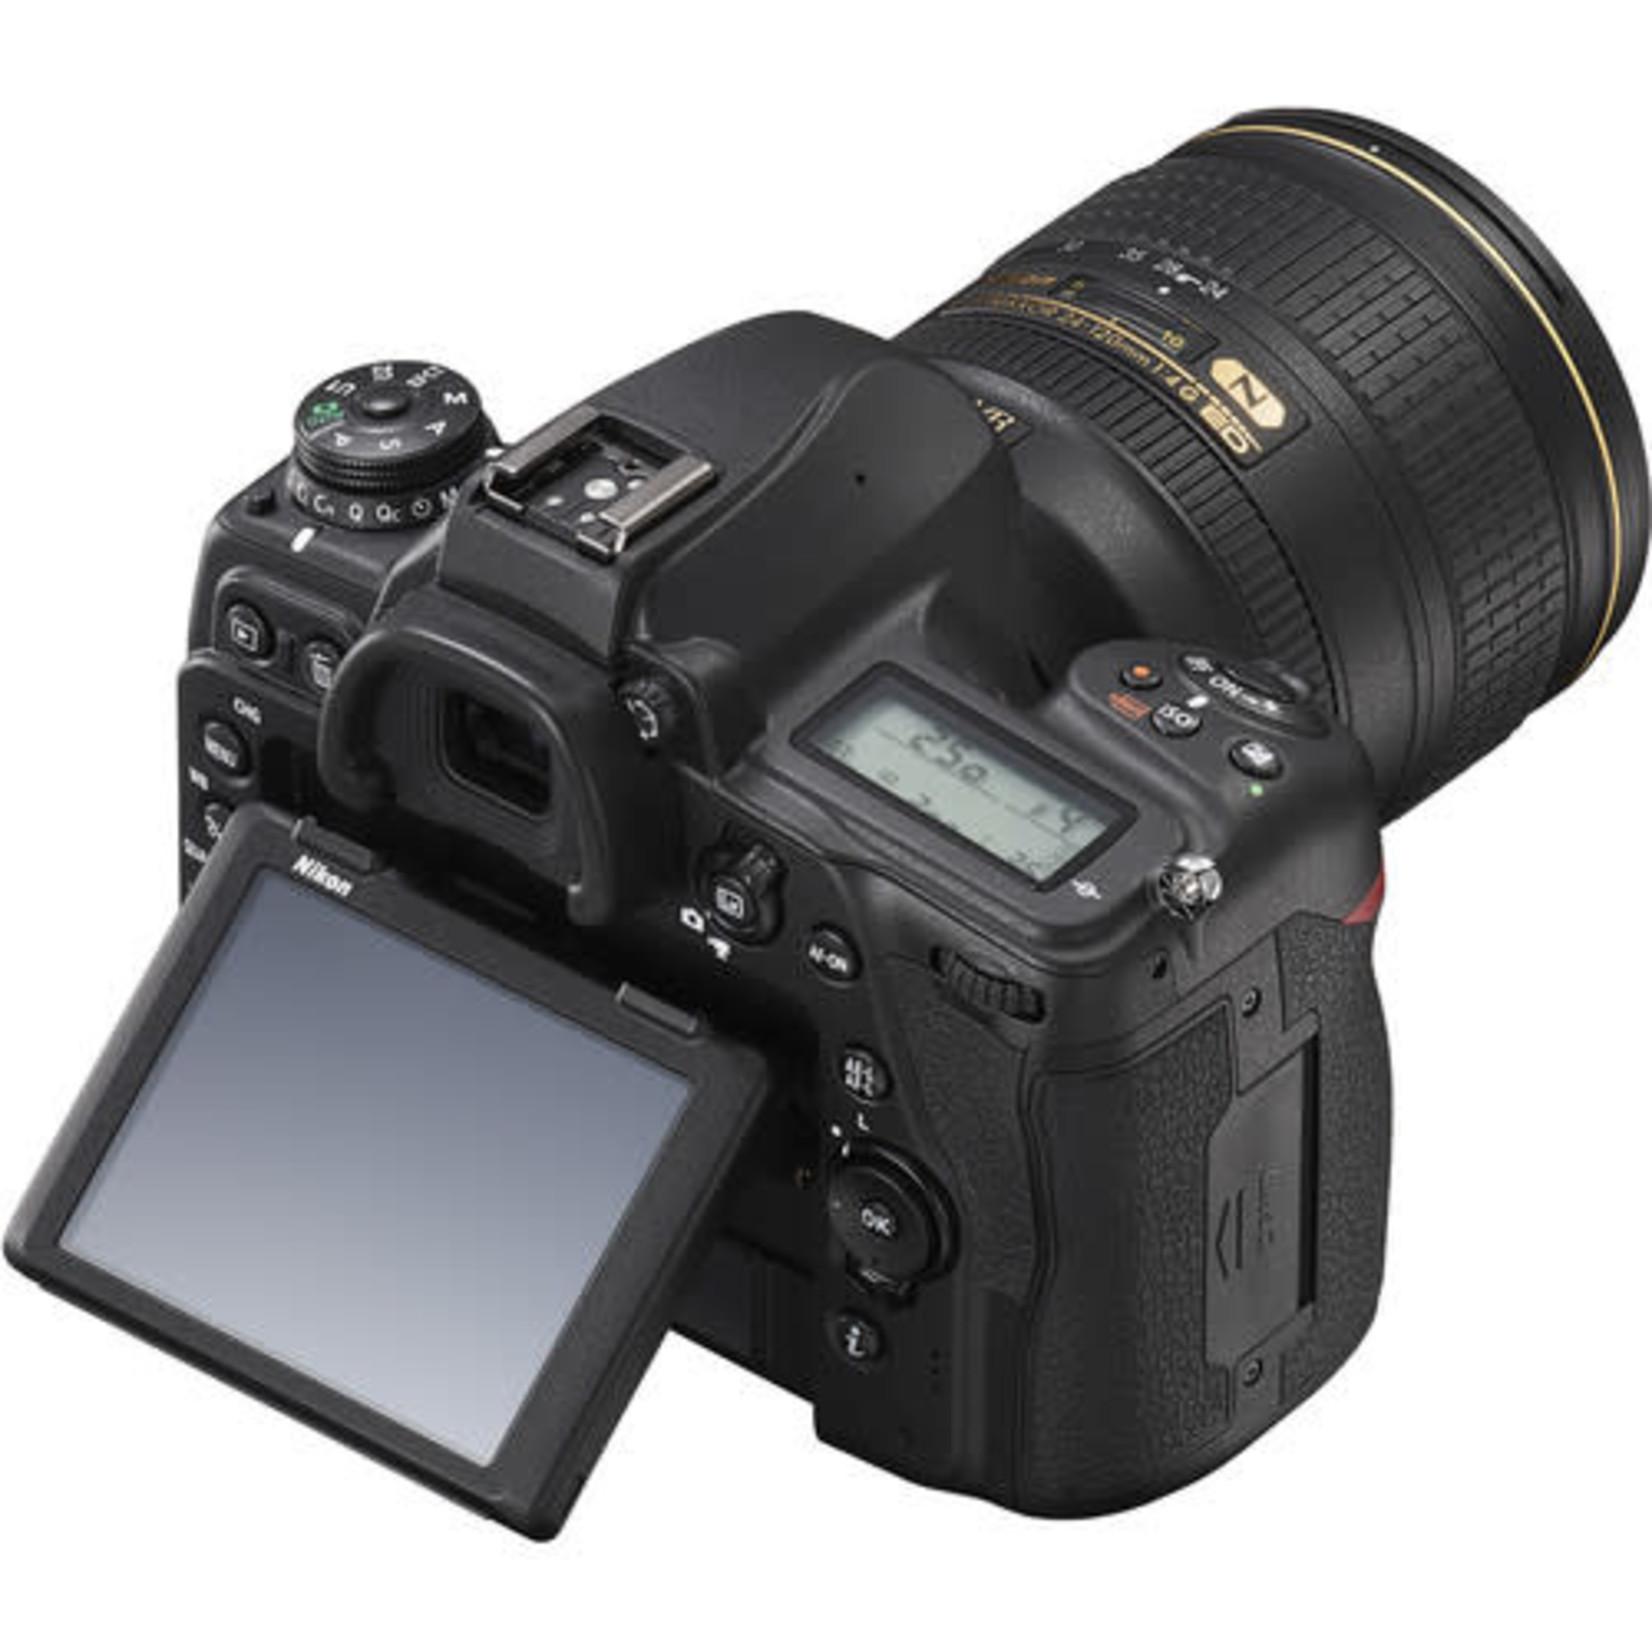 Nikon Nikon D780 DSLR Camera with 24-120mm Lens